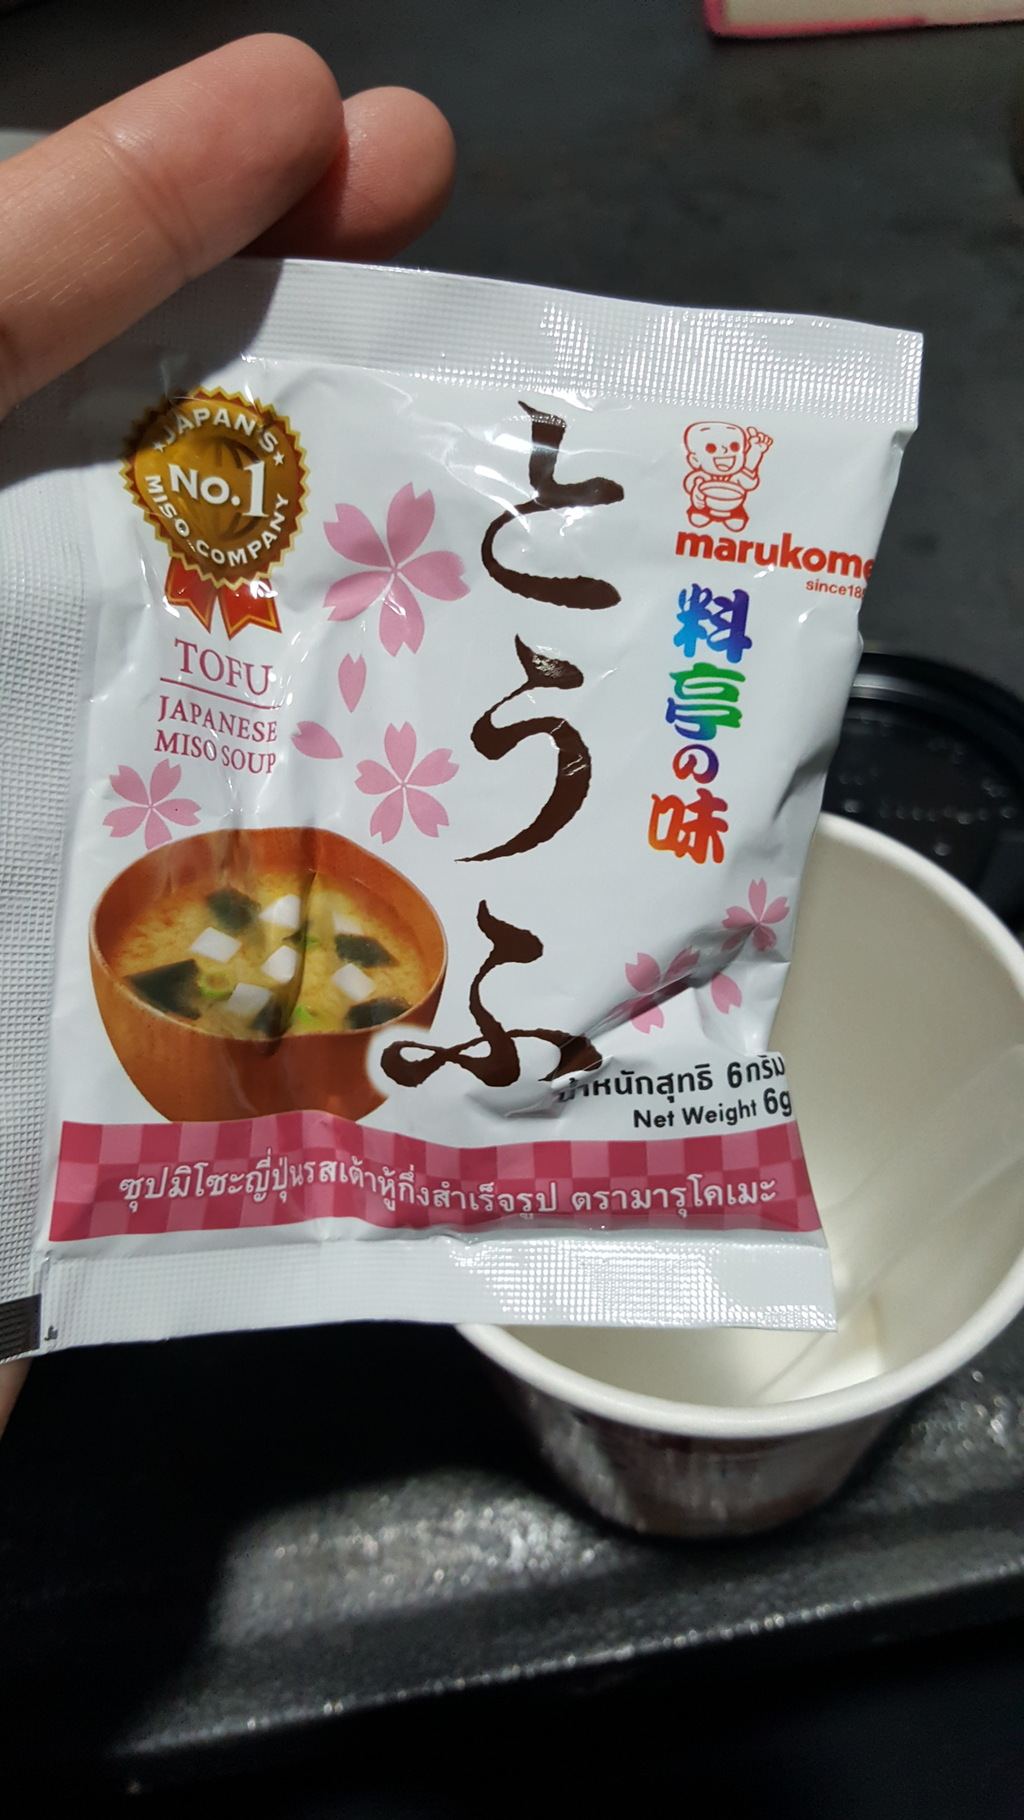 Marukome tofu miso soup cup ซุปมิโซะกึ่งสำเร็จรูปผสมเต้าหูและสาหร่ายทะเลวากาเมะ รีวิว